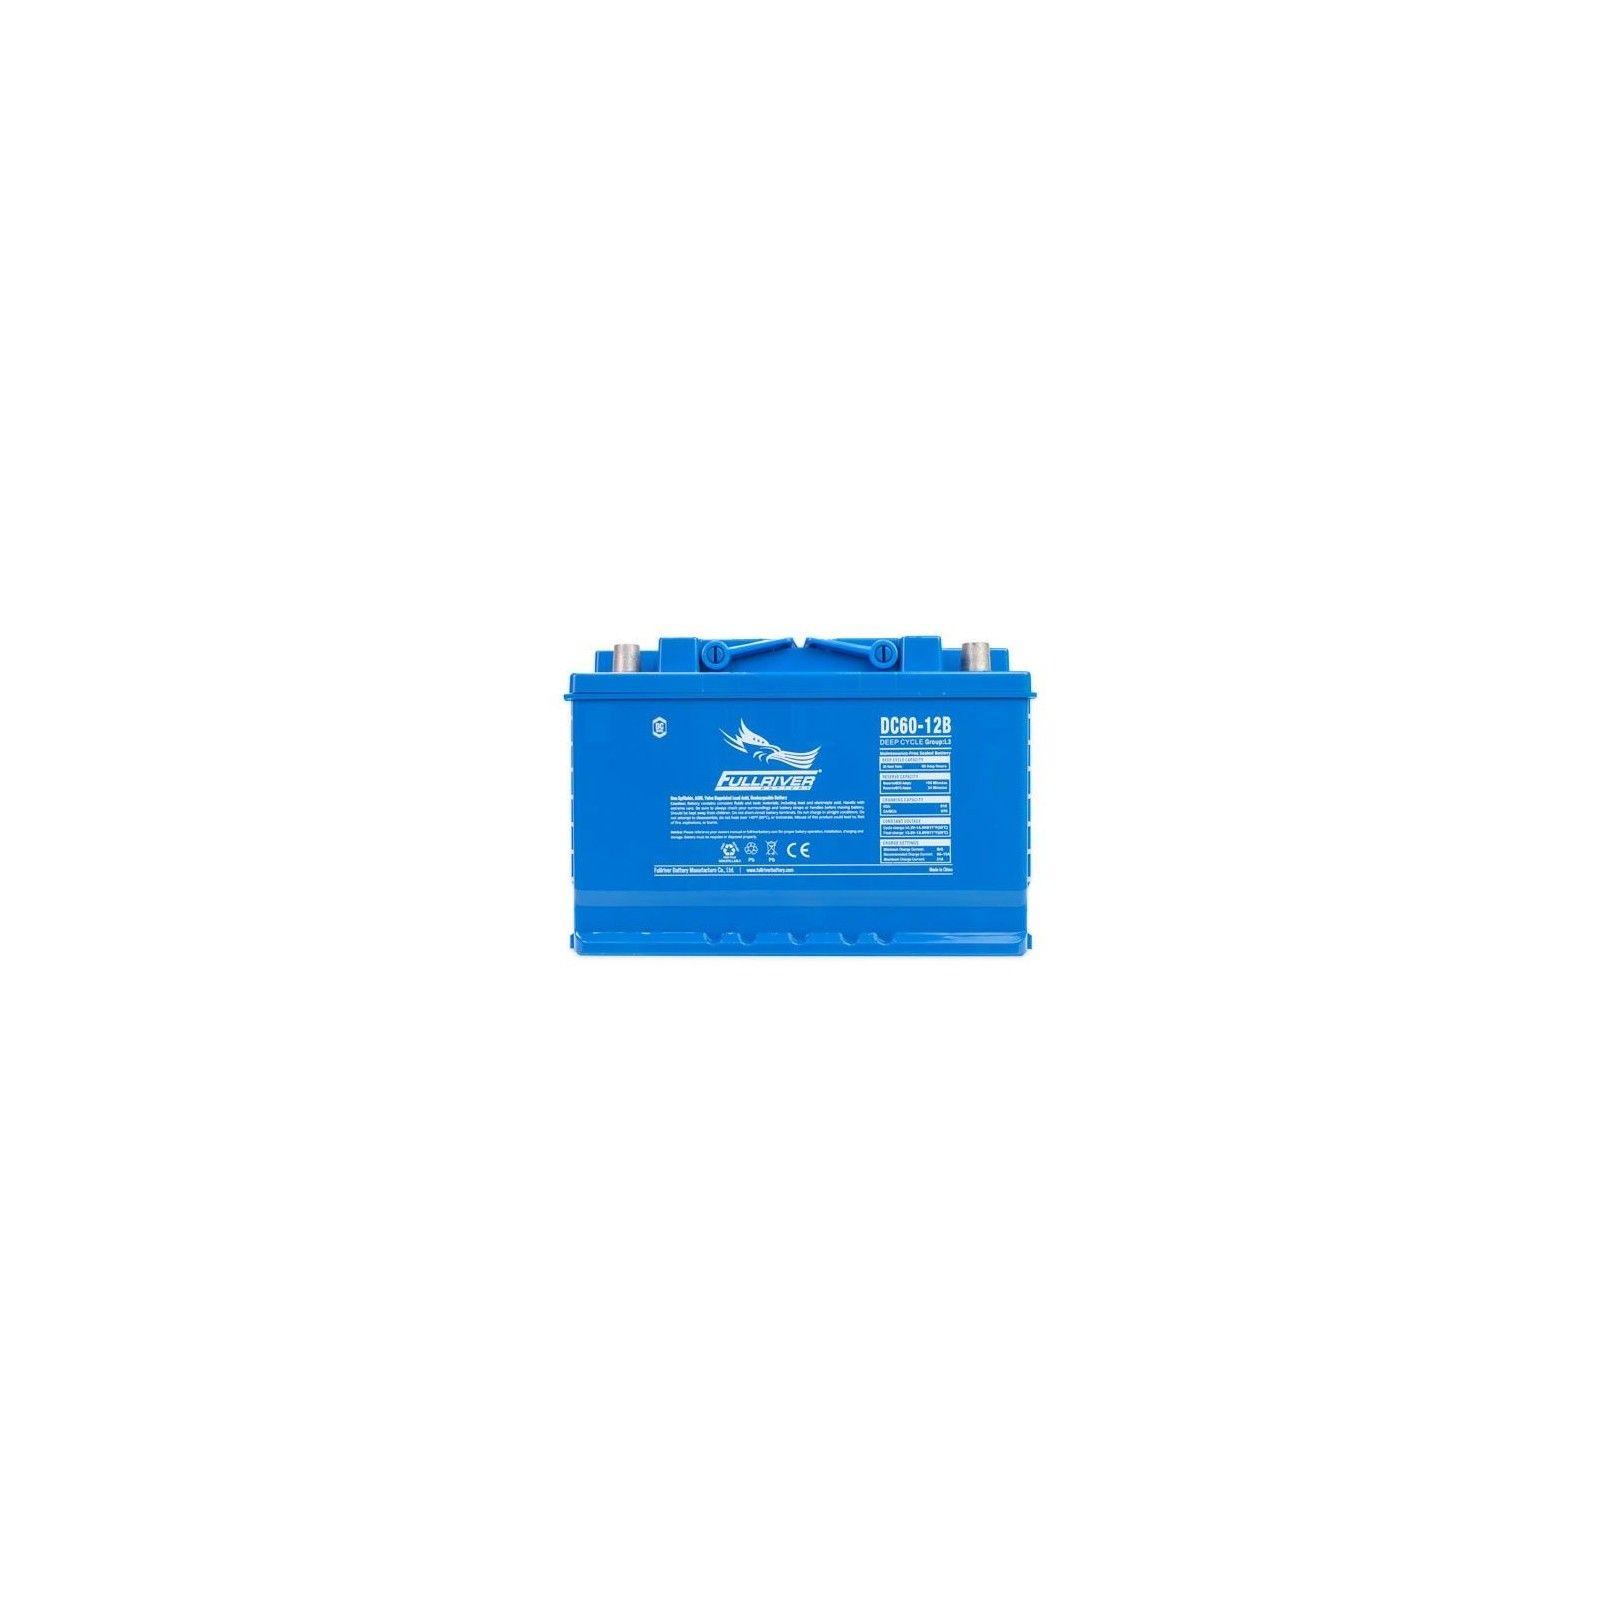 Battery Fullriver DC60-12B 60Ah 510A 12V Dc FULLRIVER - 1